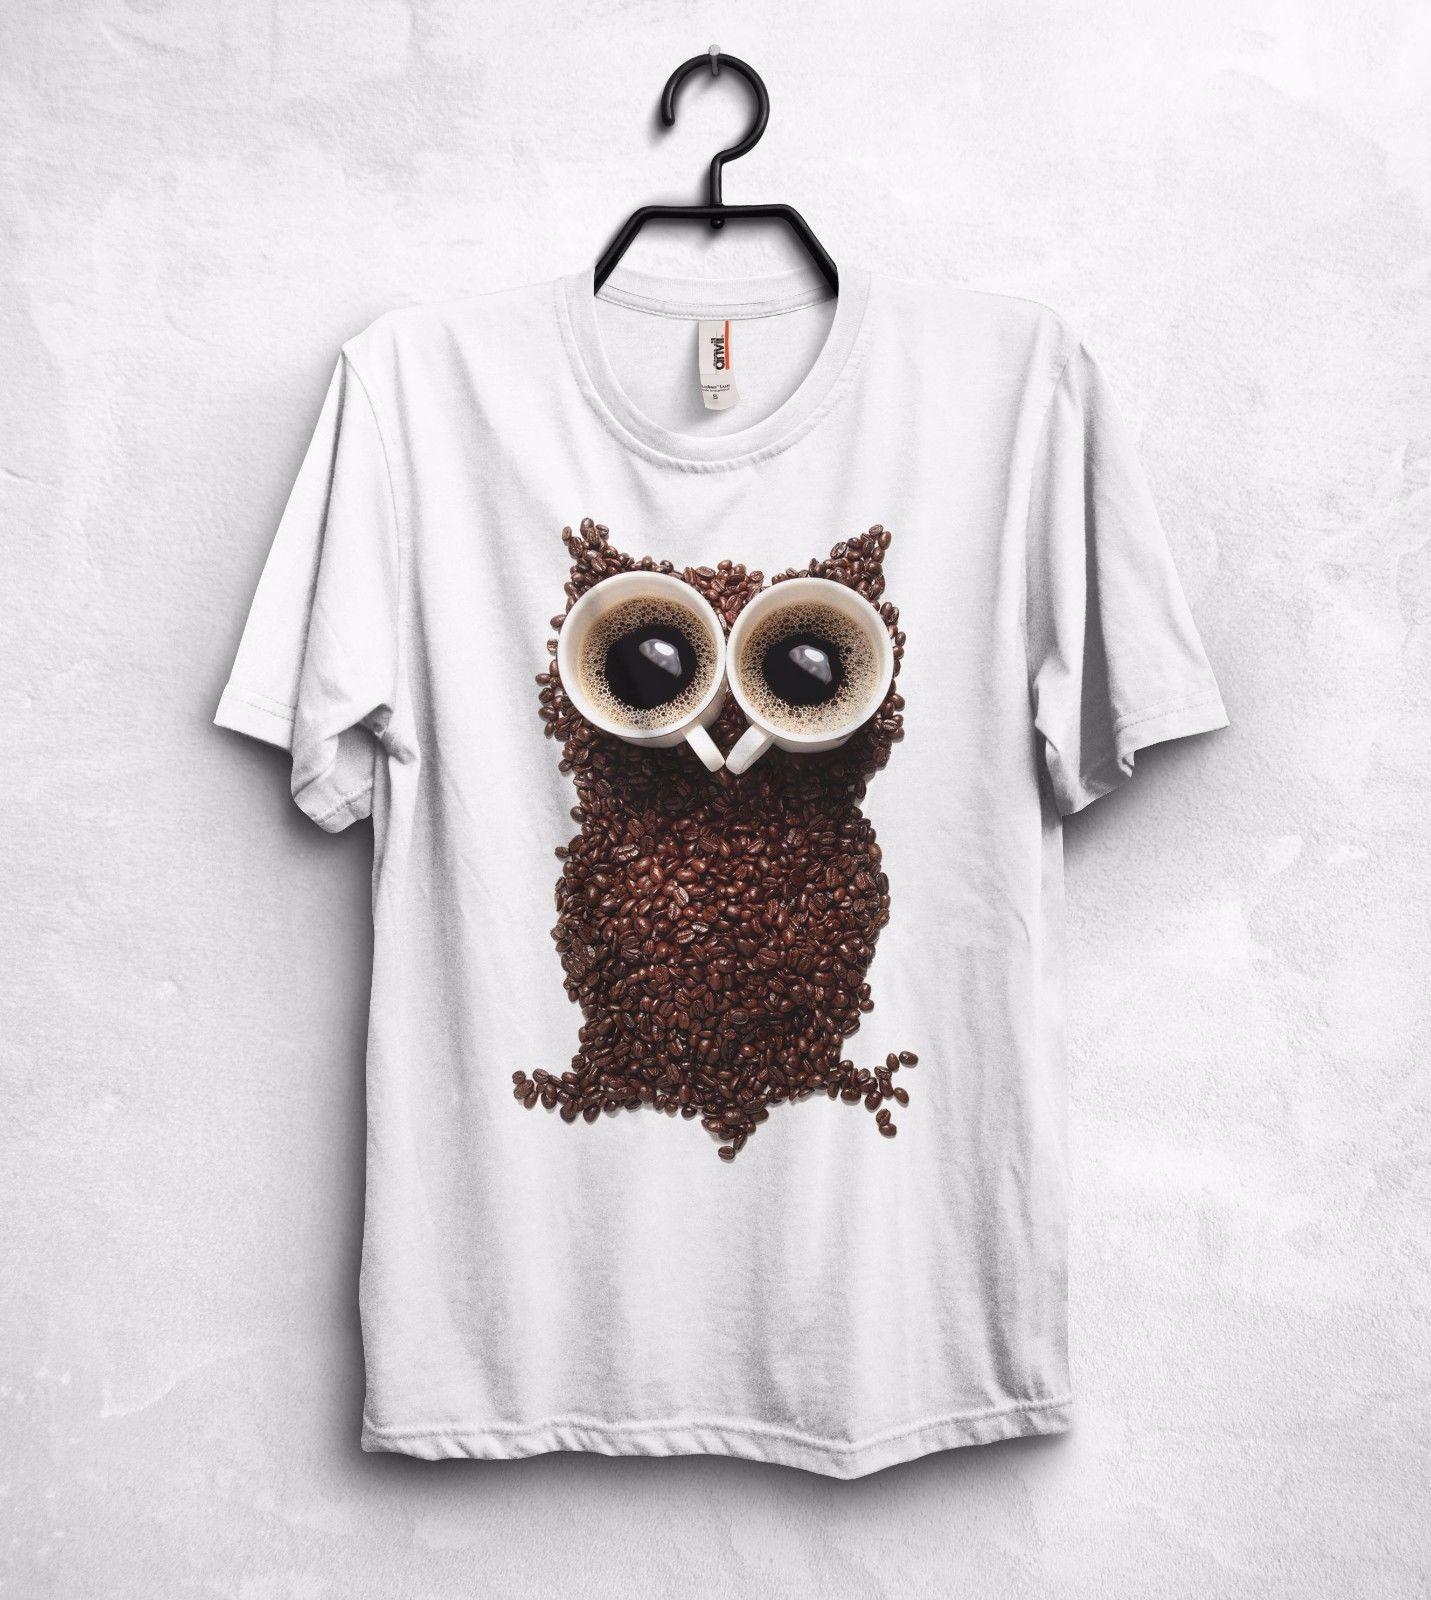 b6e5377a1 Compre Camisa Da Coruja De Café T Top Animais Feijão Robusta Arábica Hipster  Geek Nerd Engraçado GiftFunny Frete Grátis T Casual De Luckytshirt